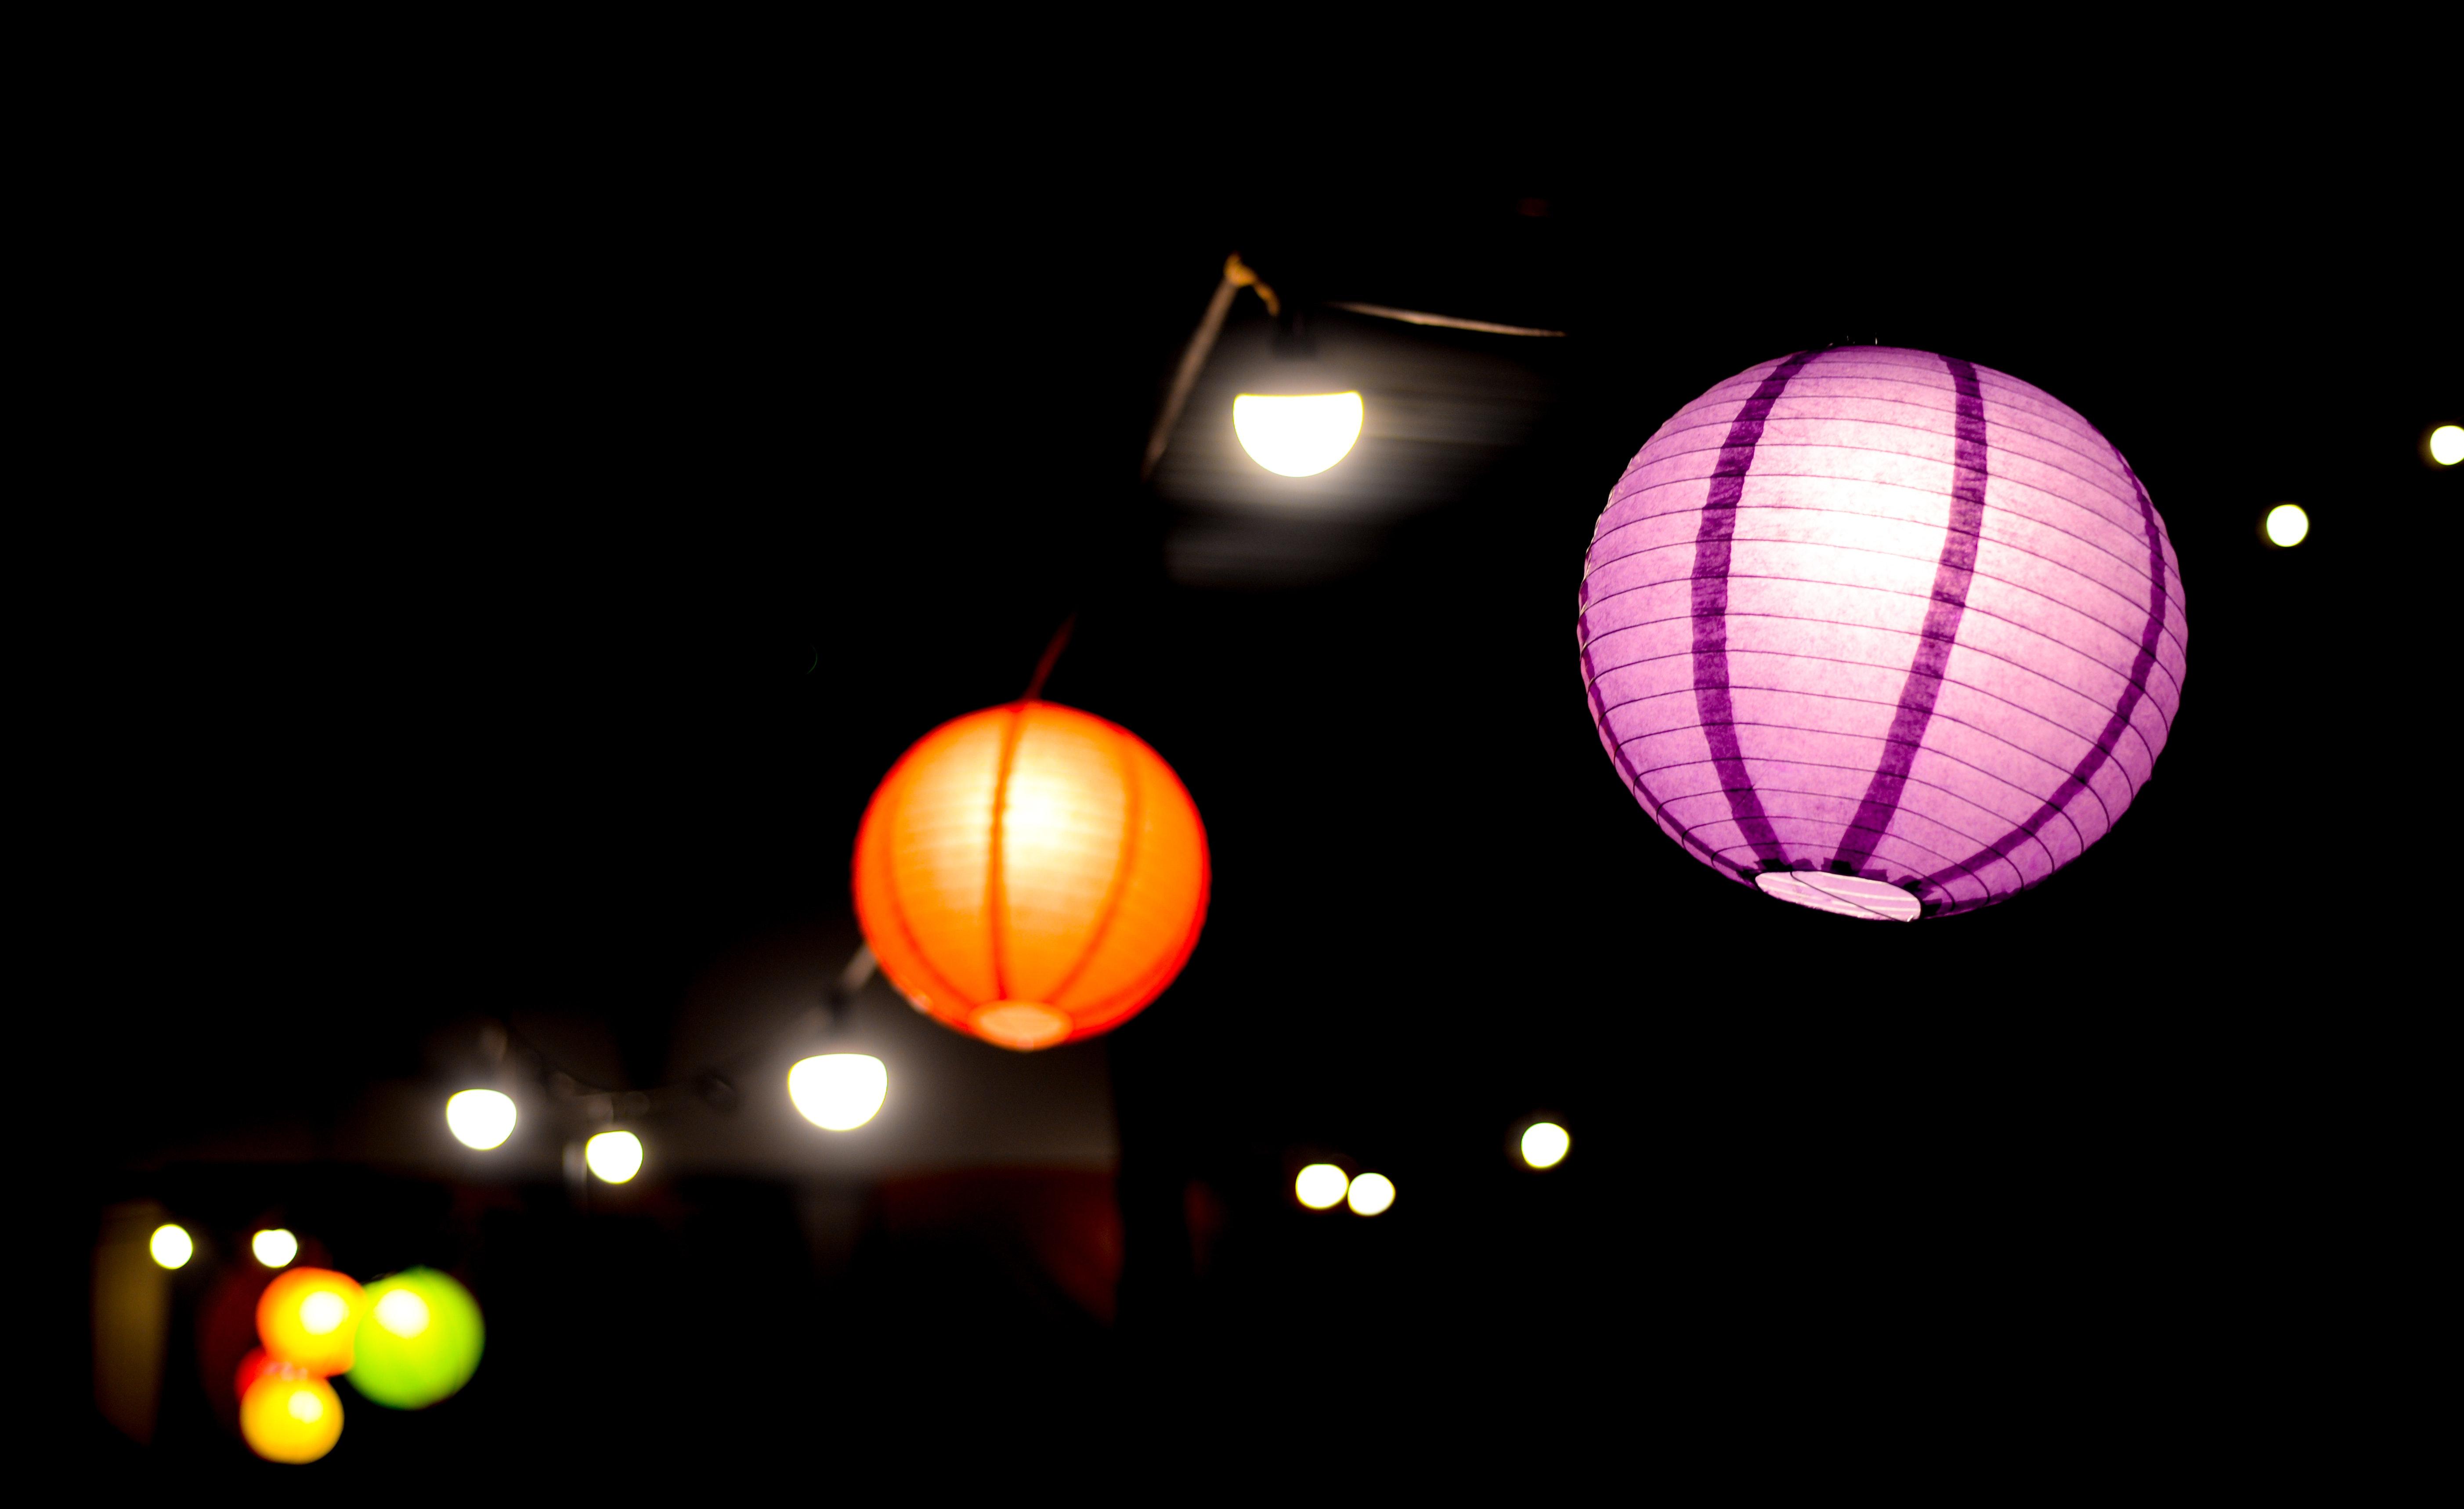 Decoration Design Illuminated Lights